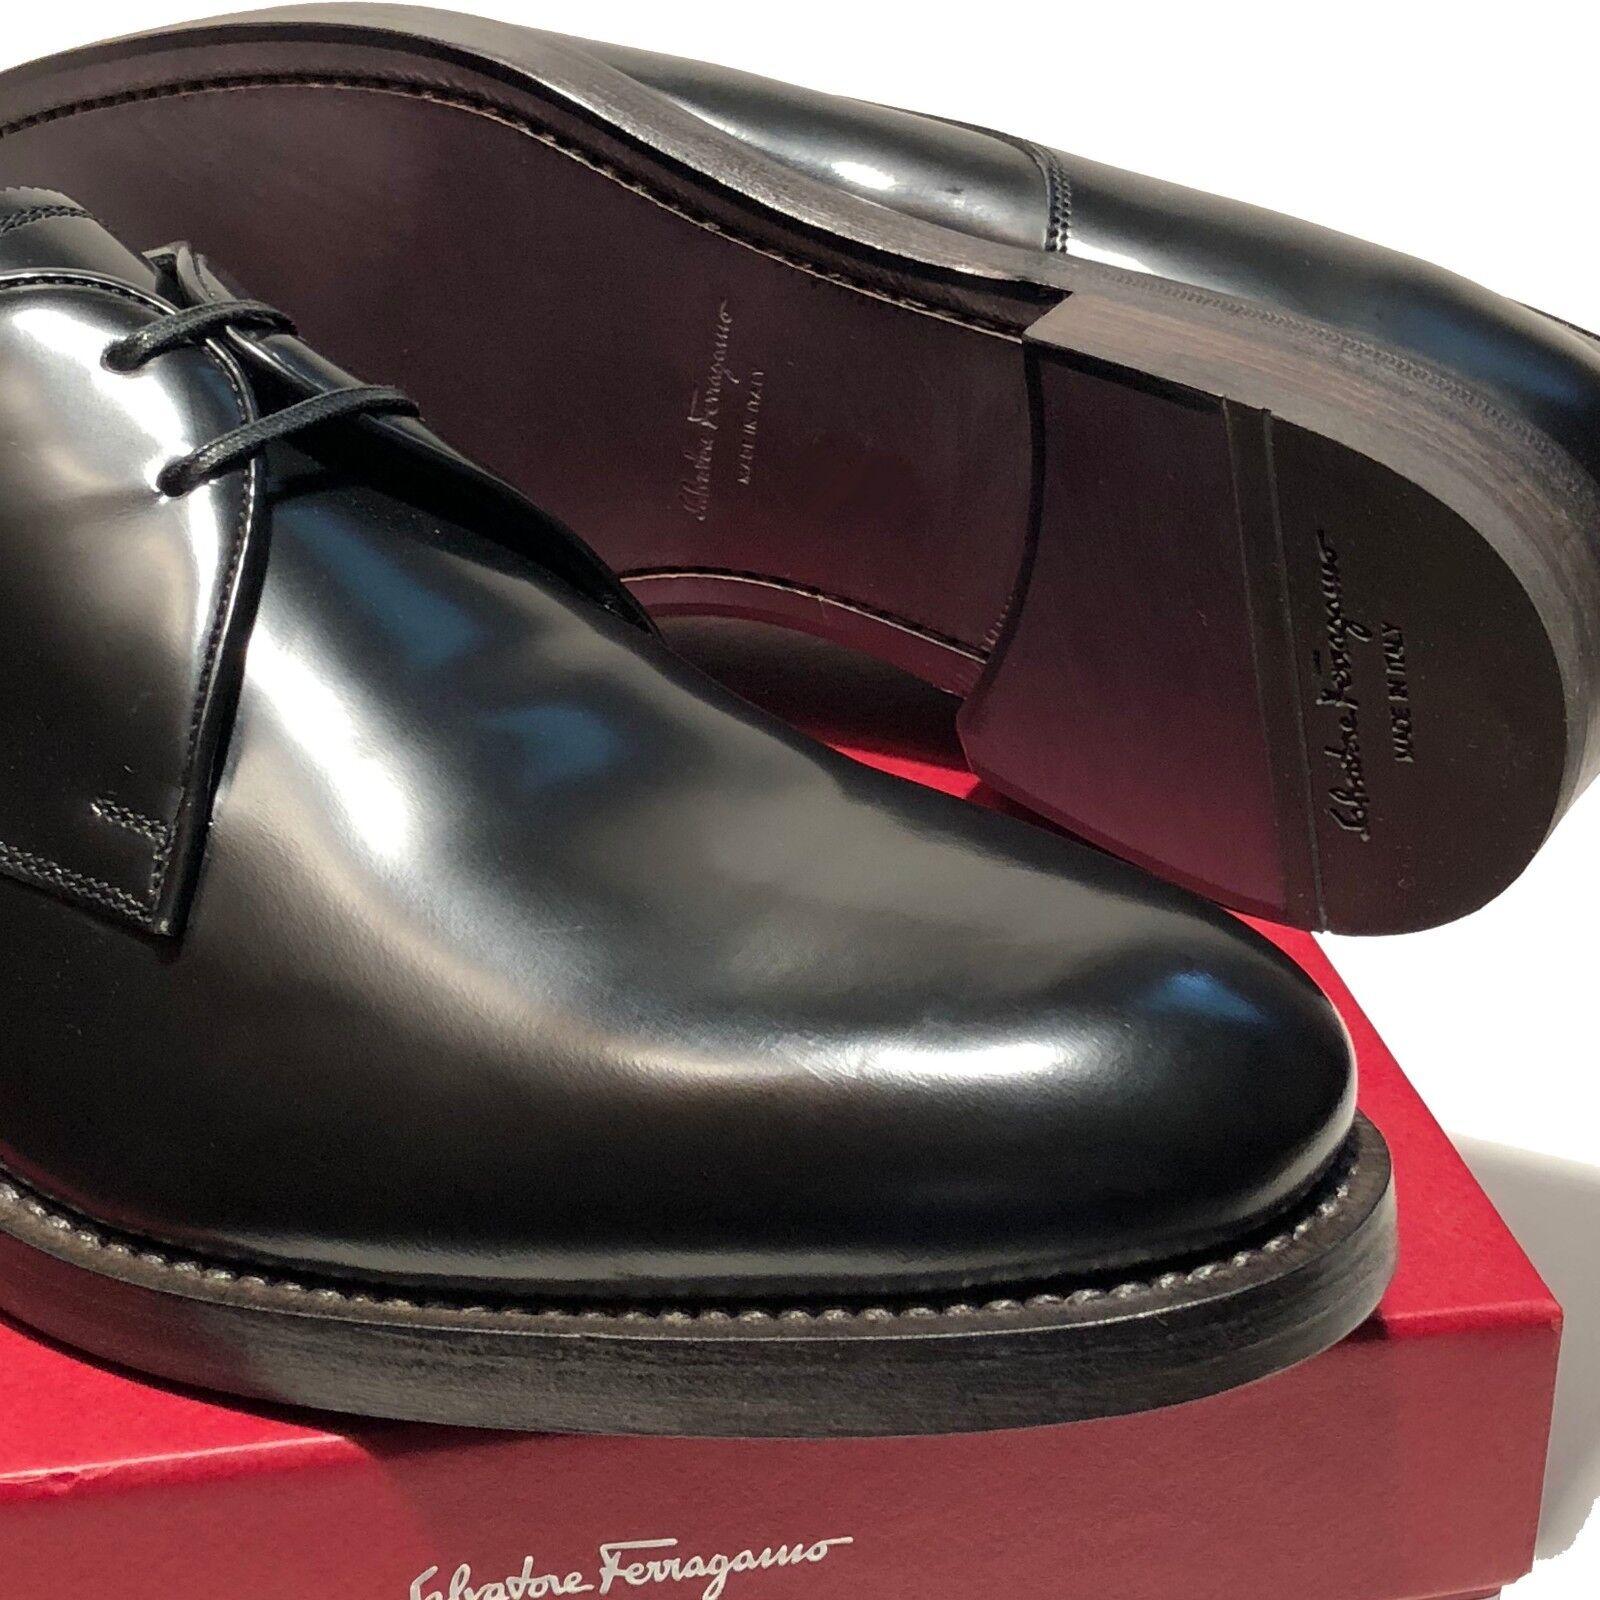 Ferragamo GIDEON Formal Men's 9.5 42.5 Black Dress Oxford shoes Tuxedo Wedding